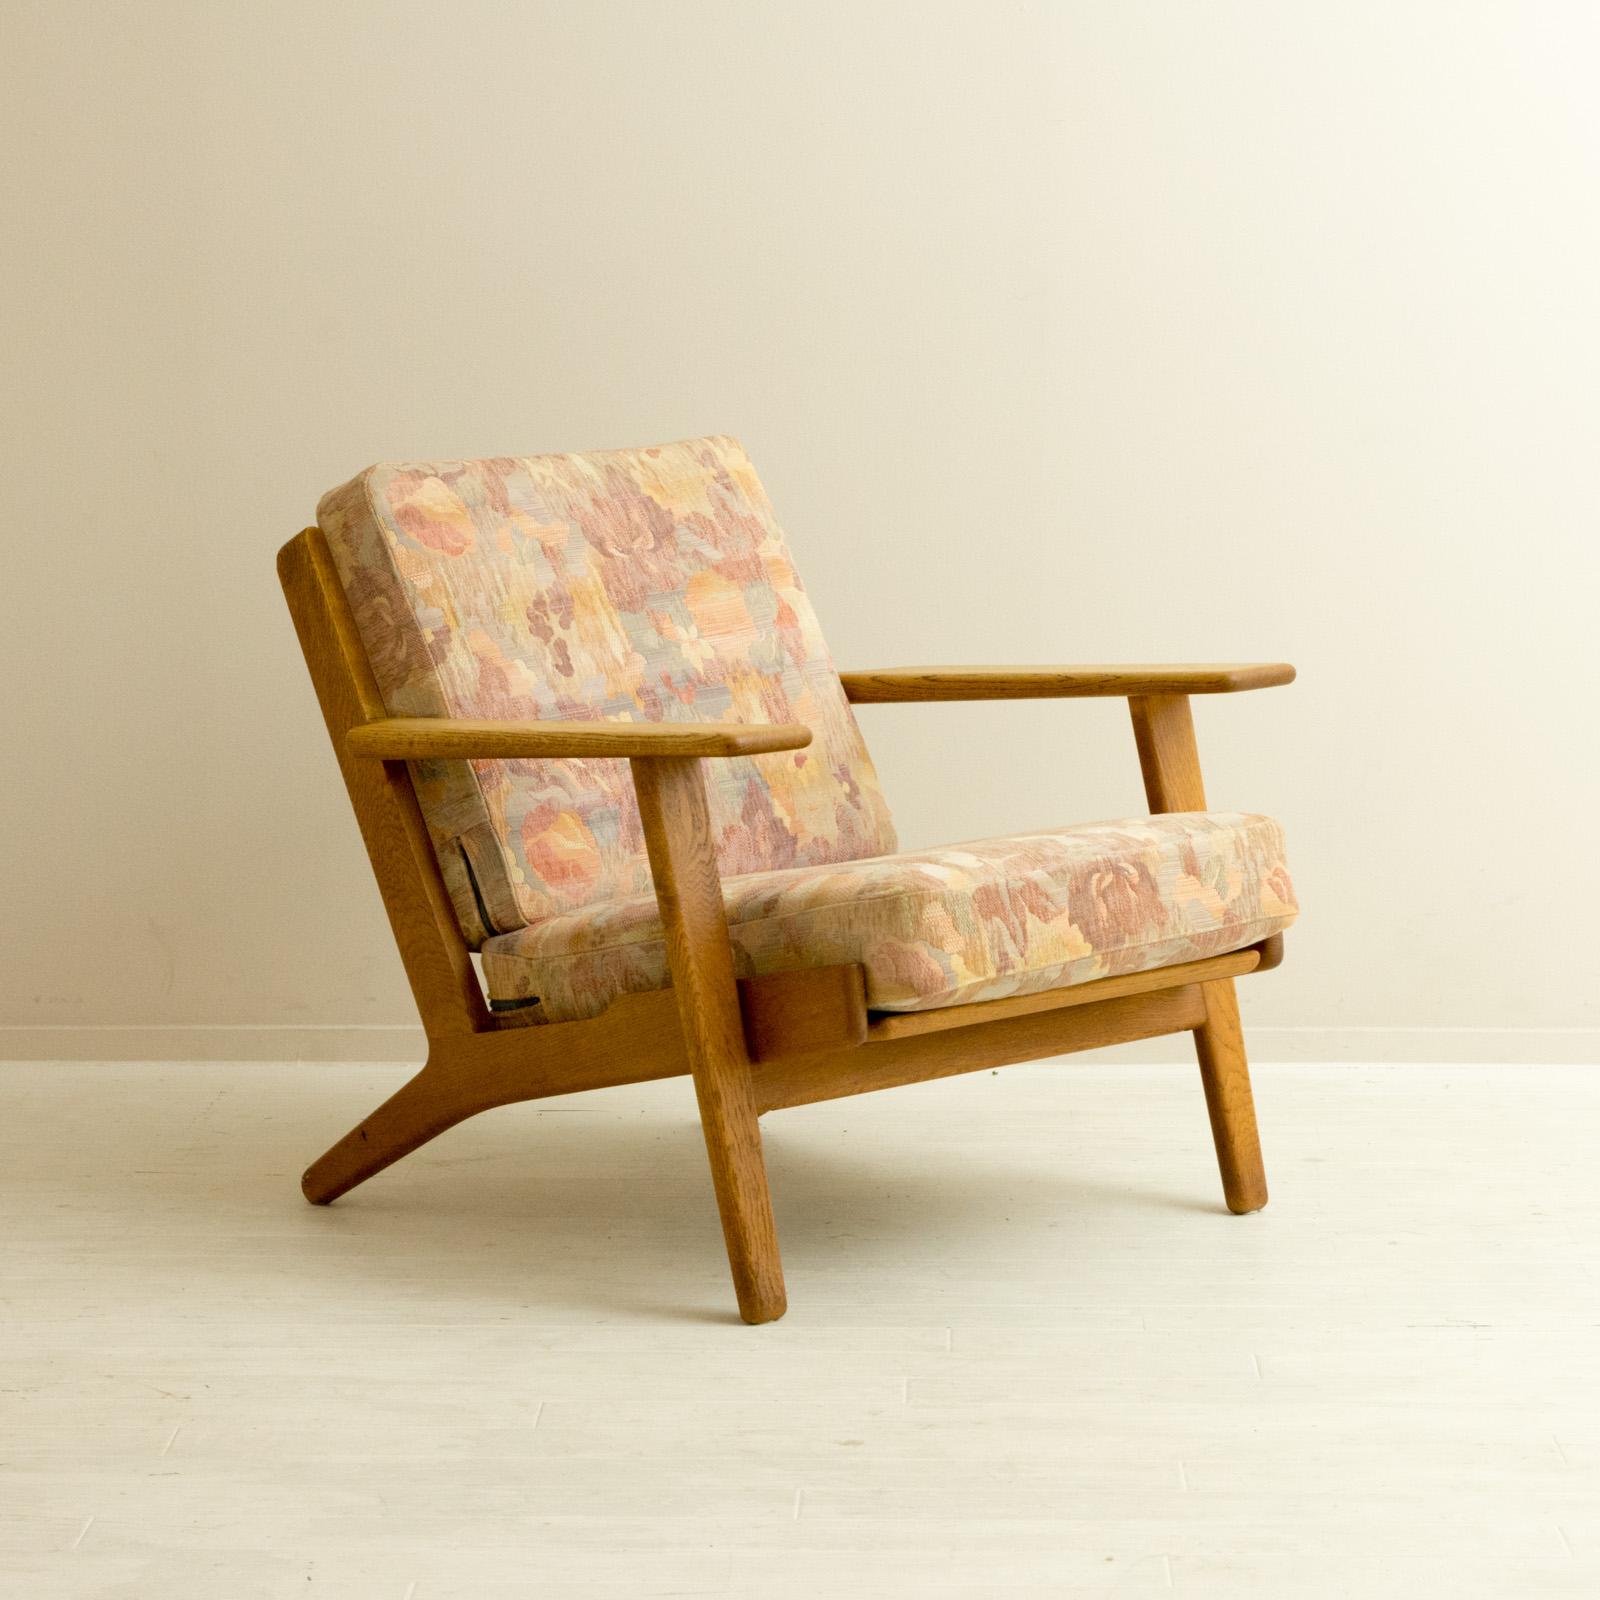 GE290 Easy Chair by Hans J Wegner